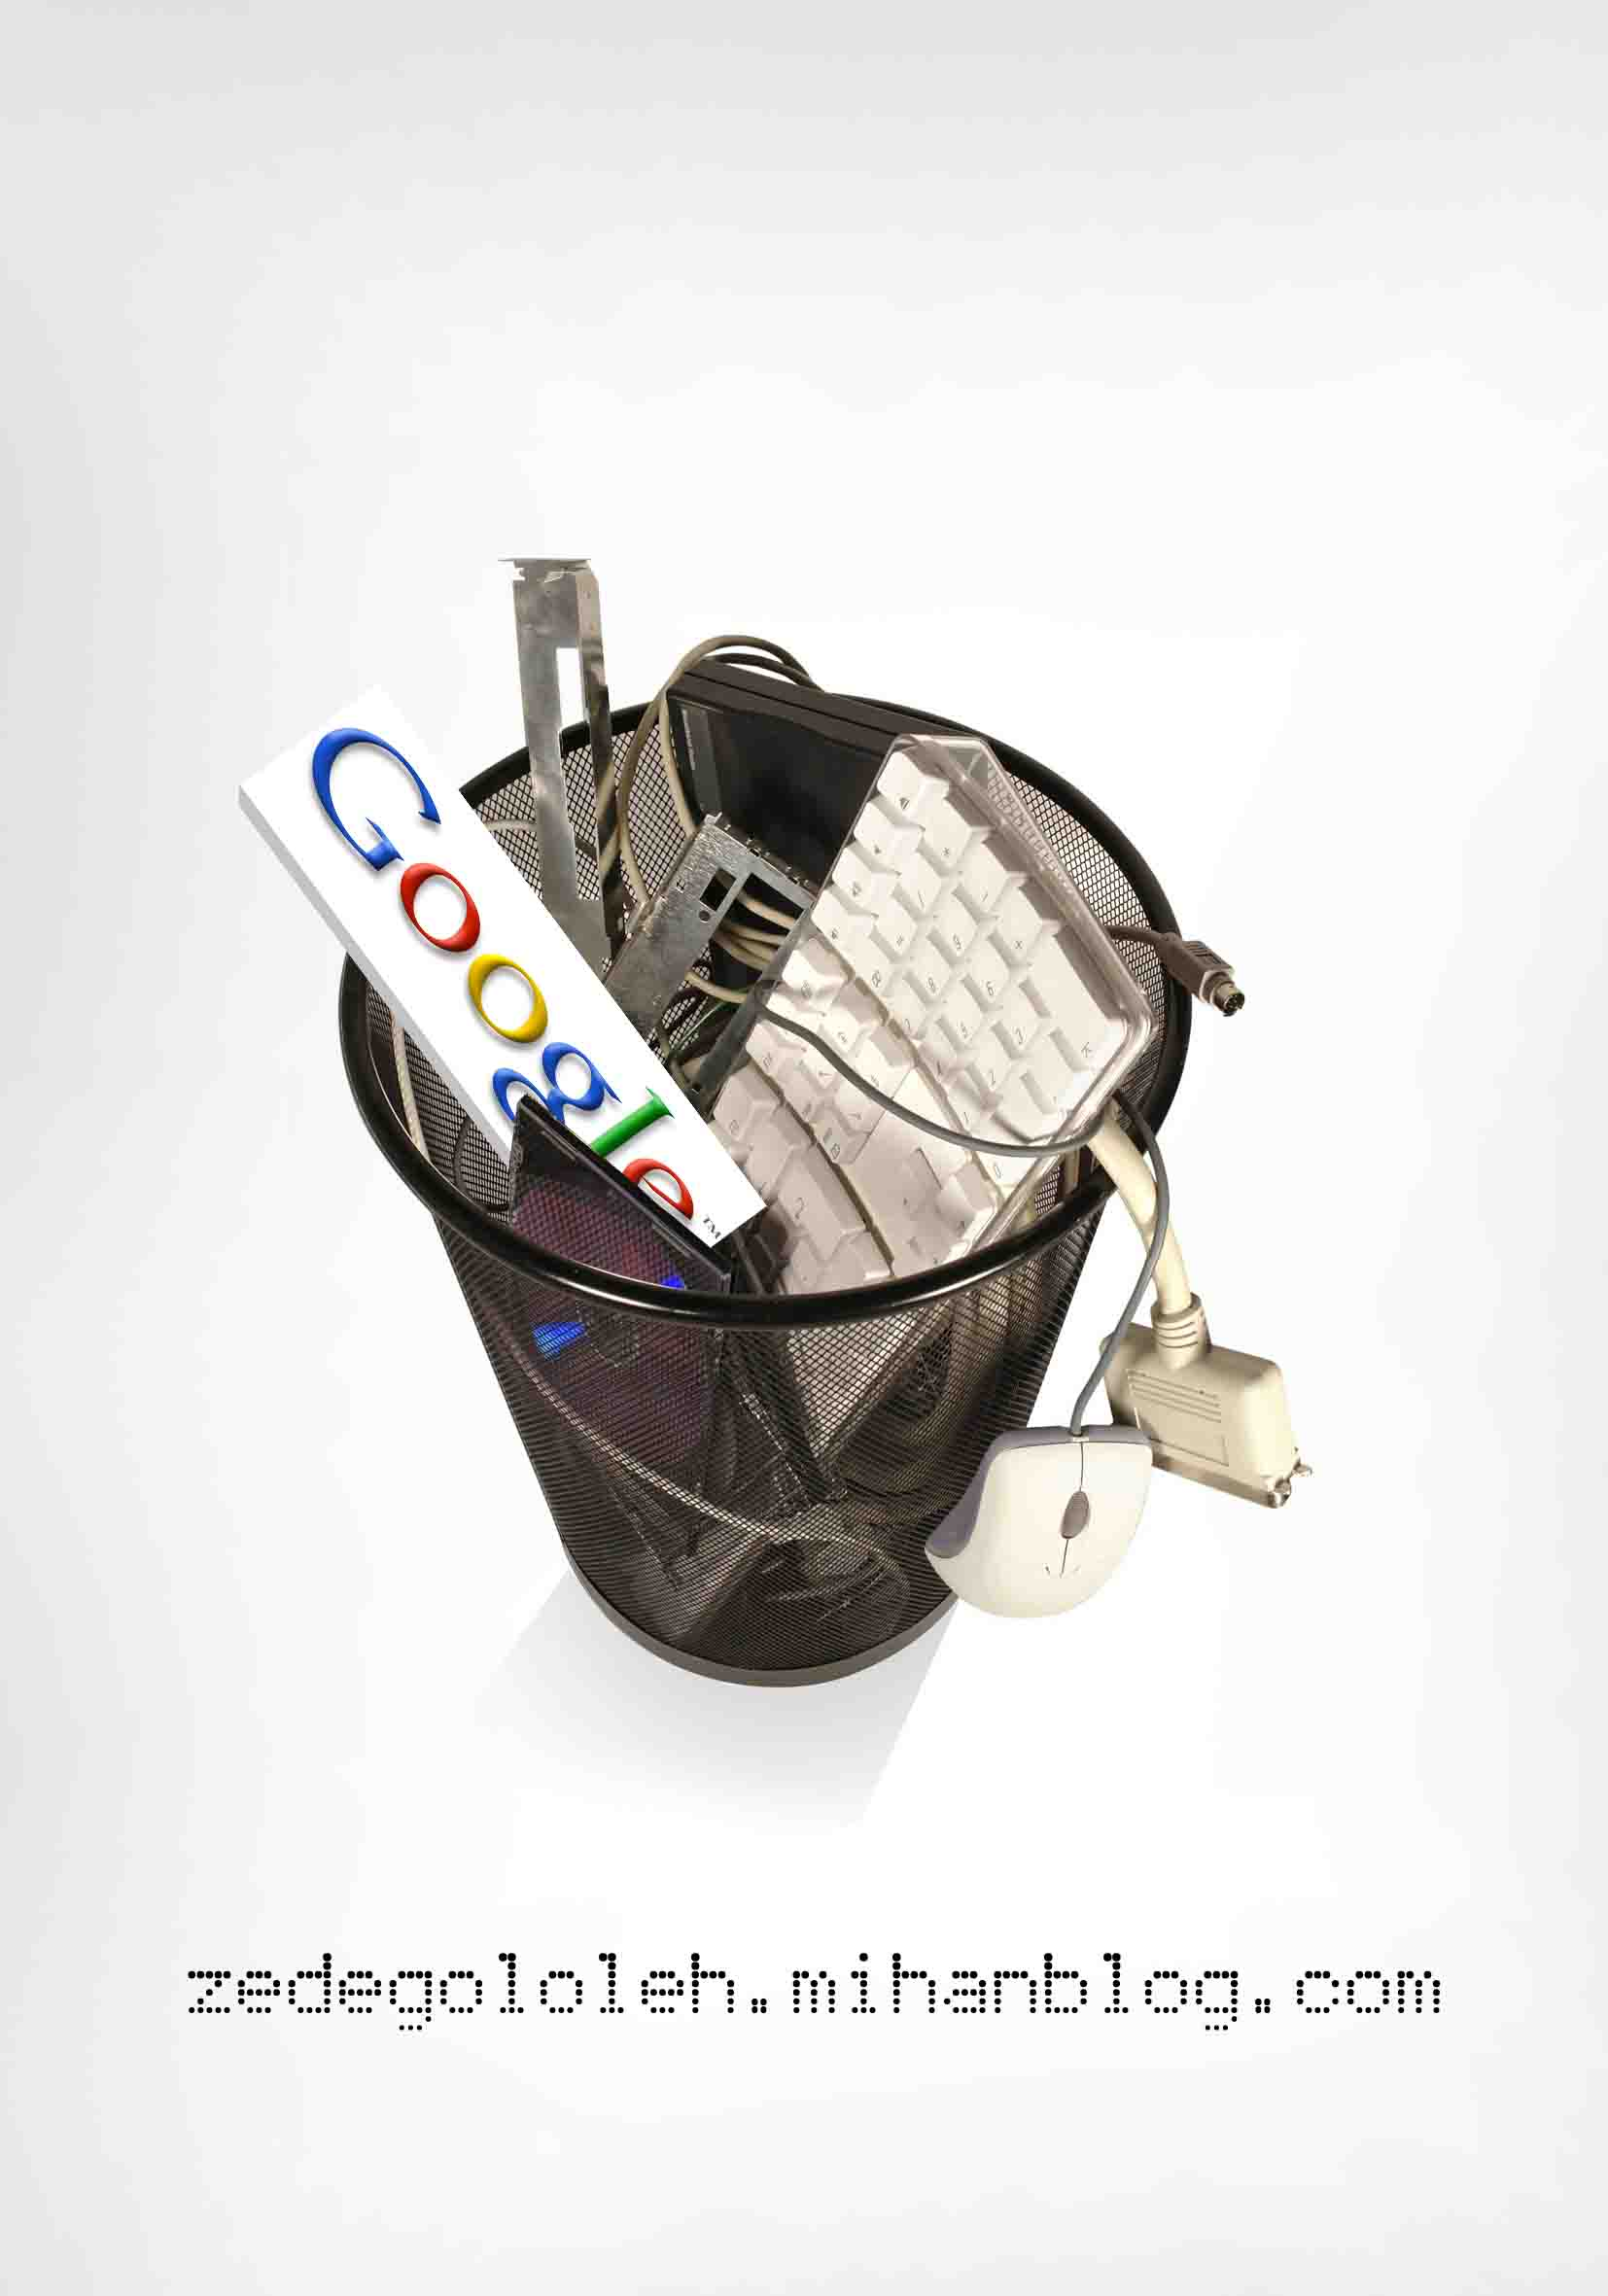 گوگل تحریم شد